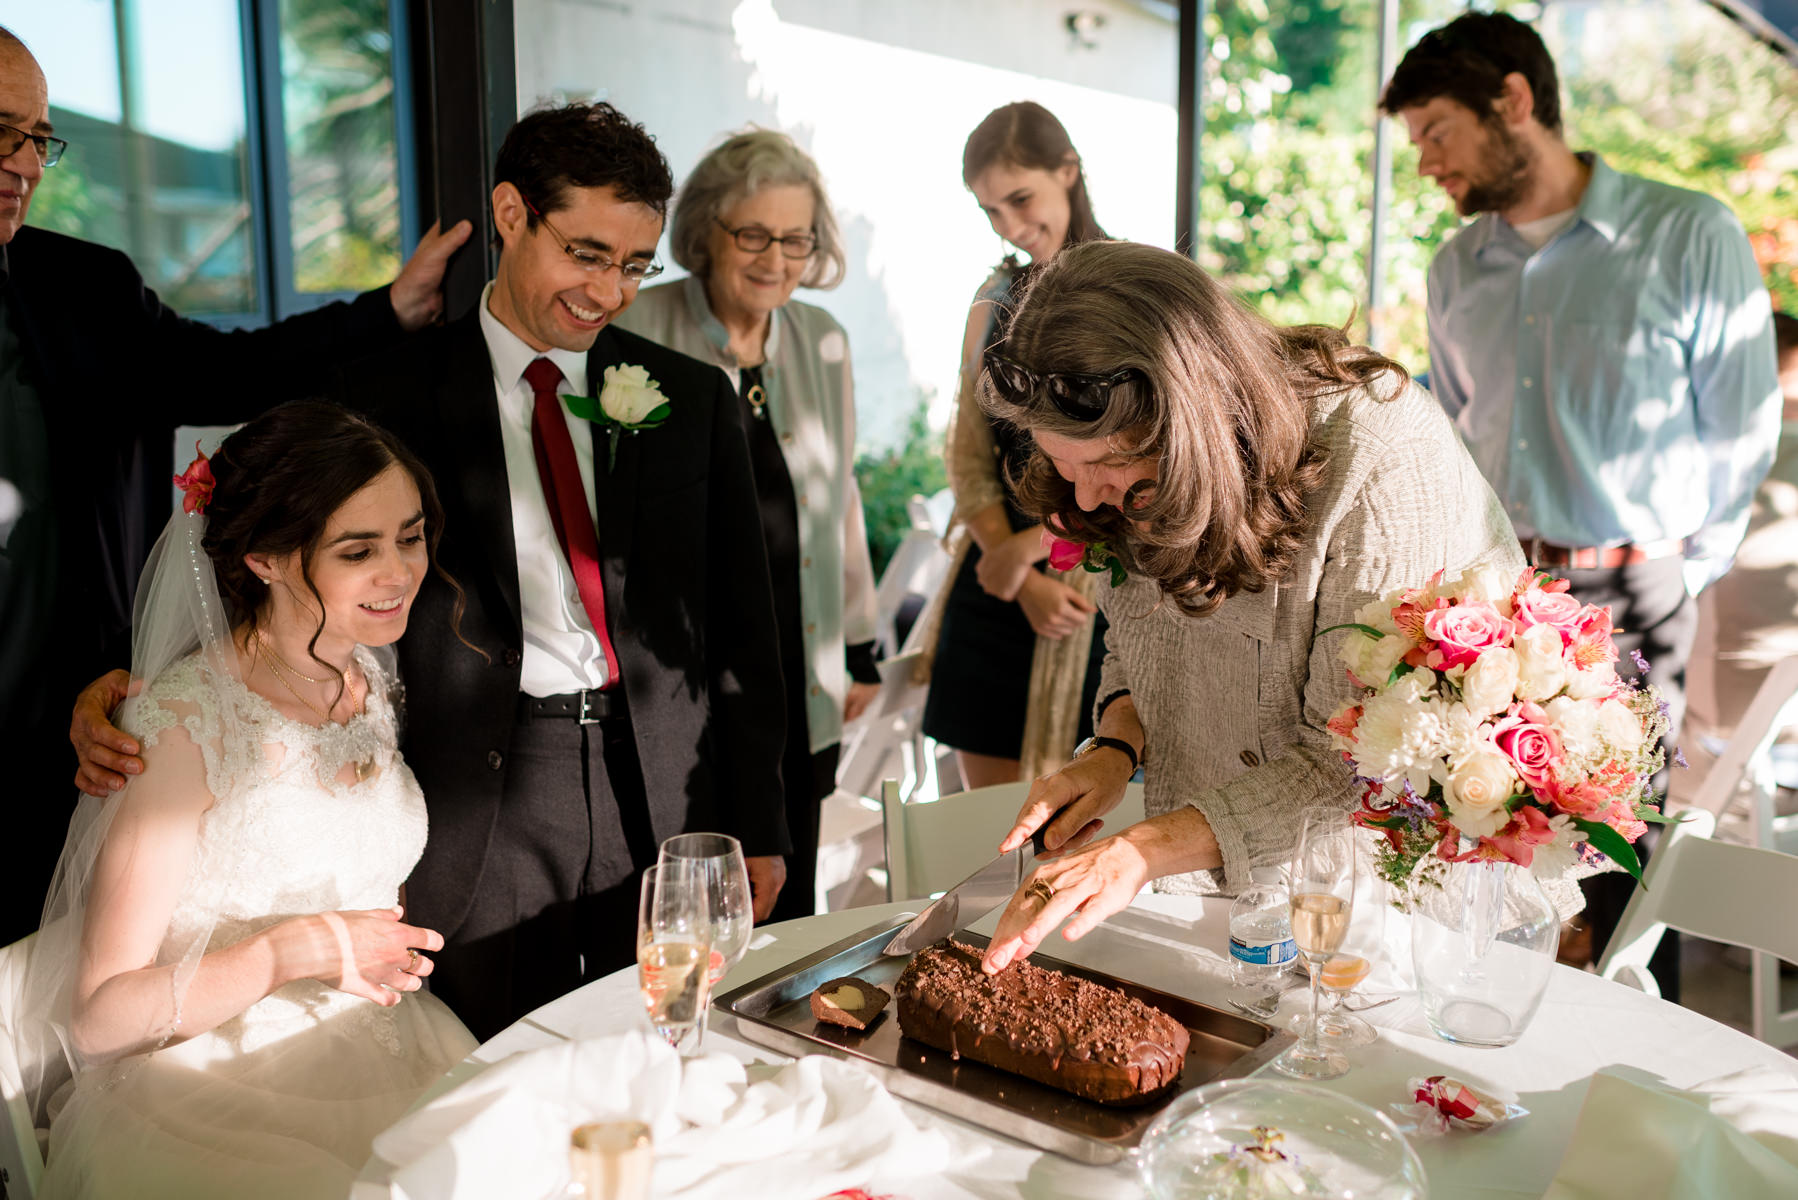 Andrew Tat - Documentary Wedding Photography - Kirkland, Washington - Emily & Cuauh - 35.JPG